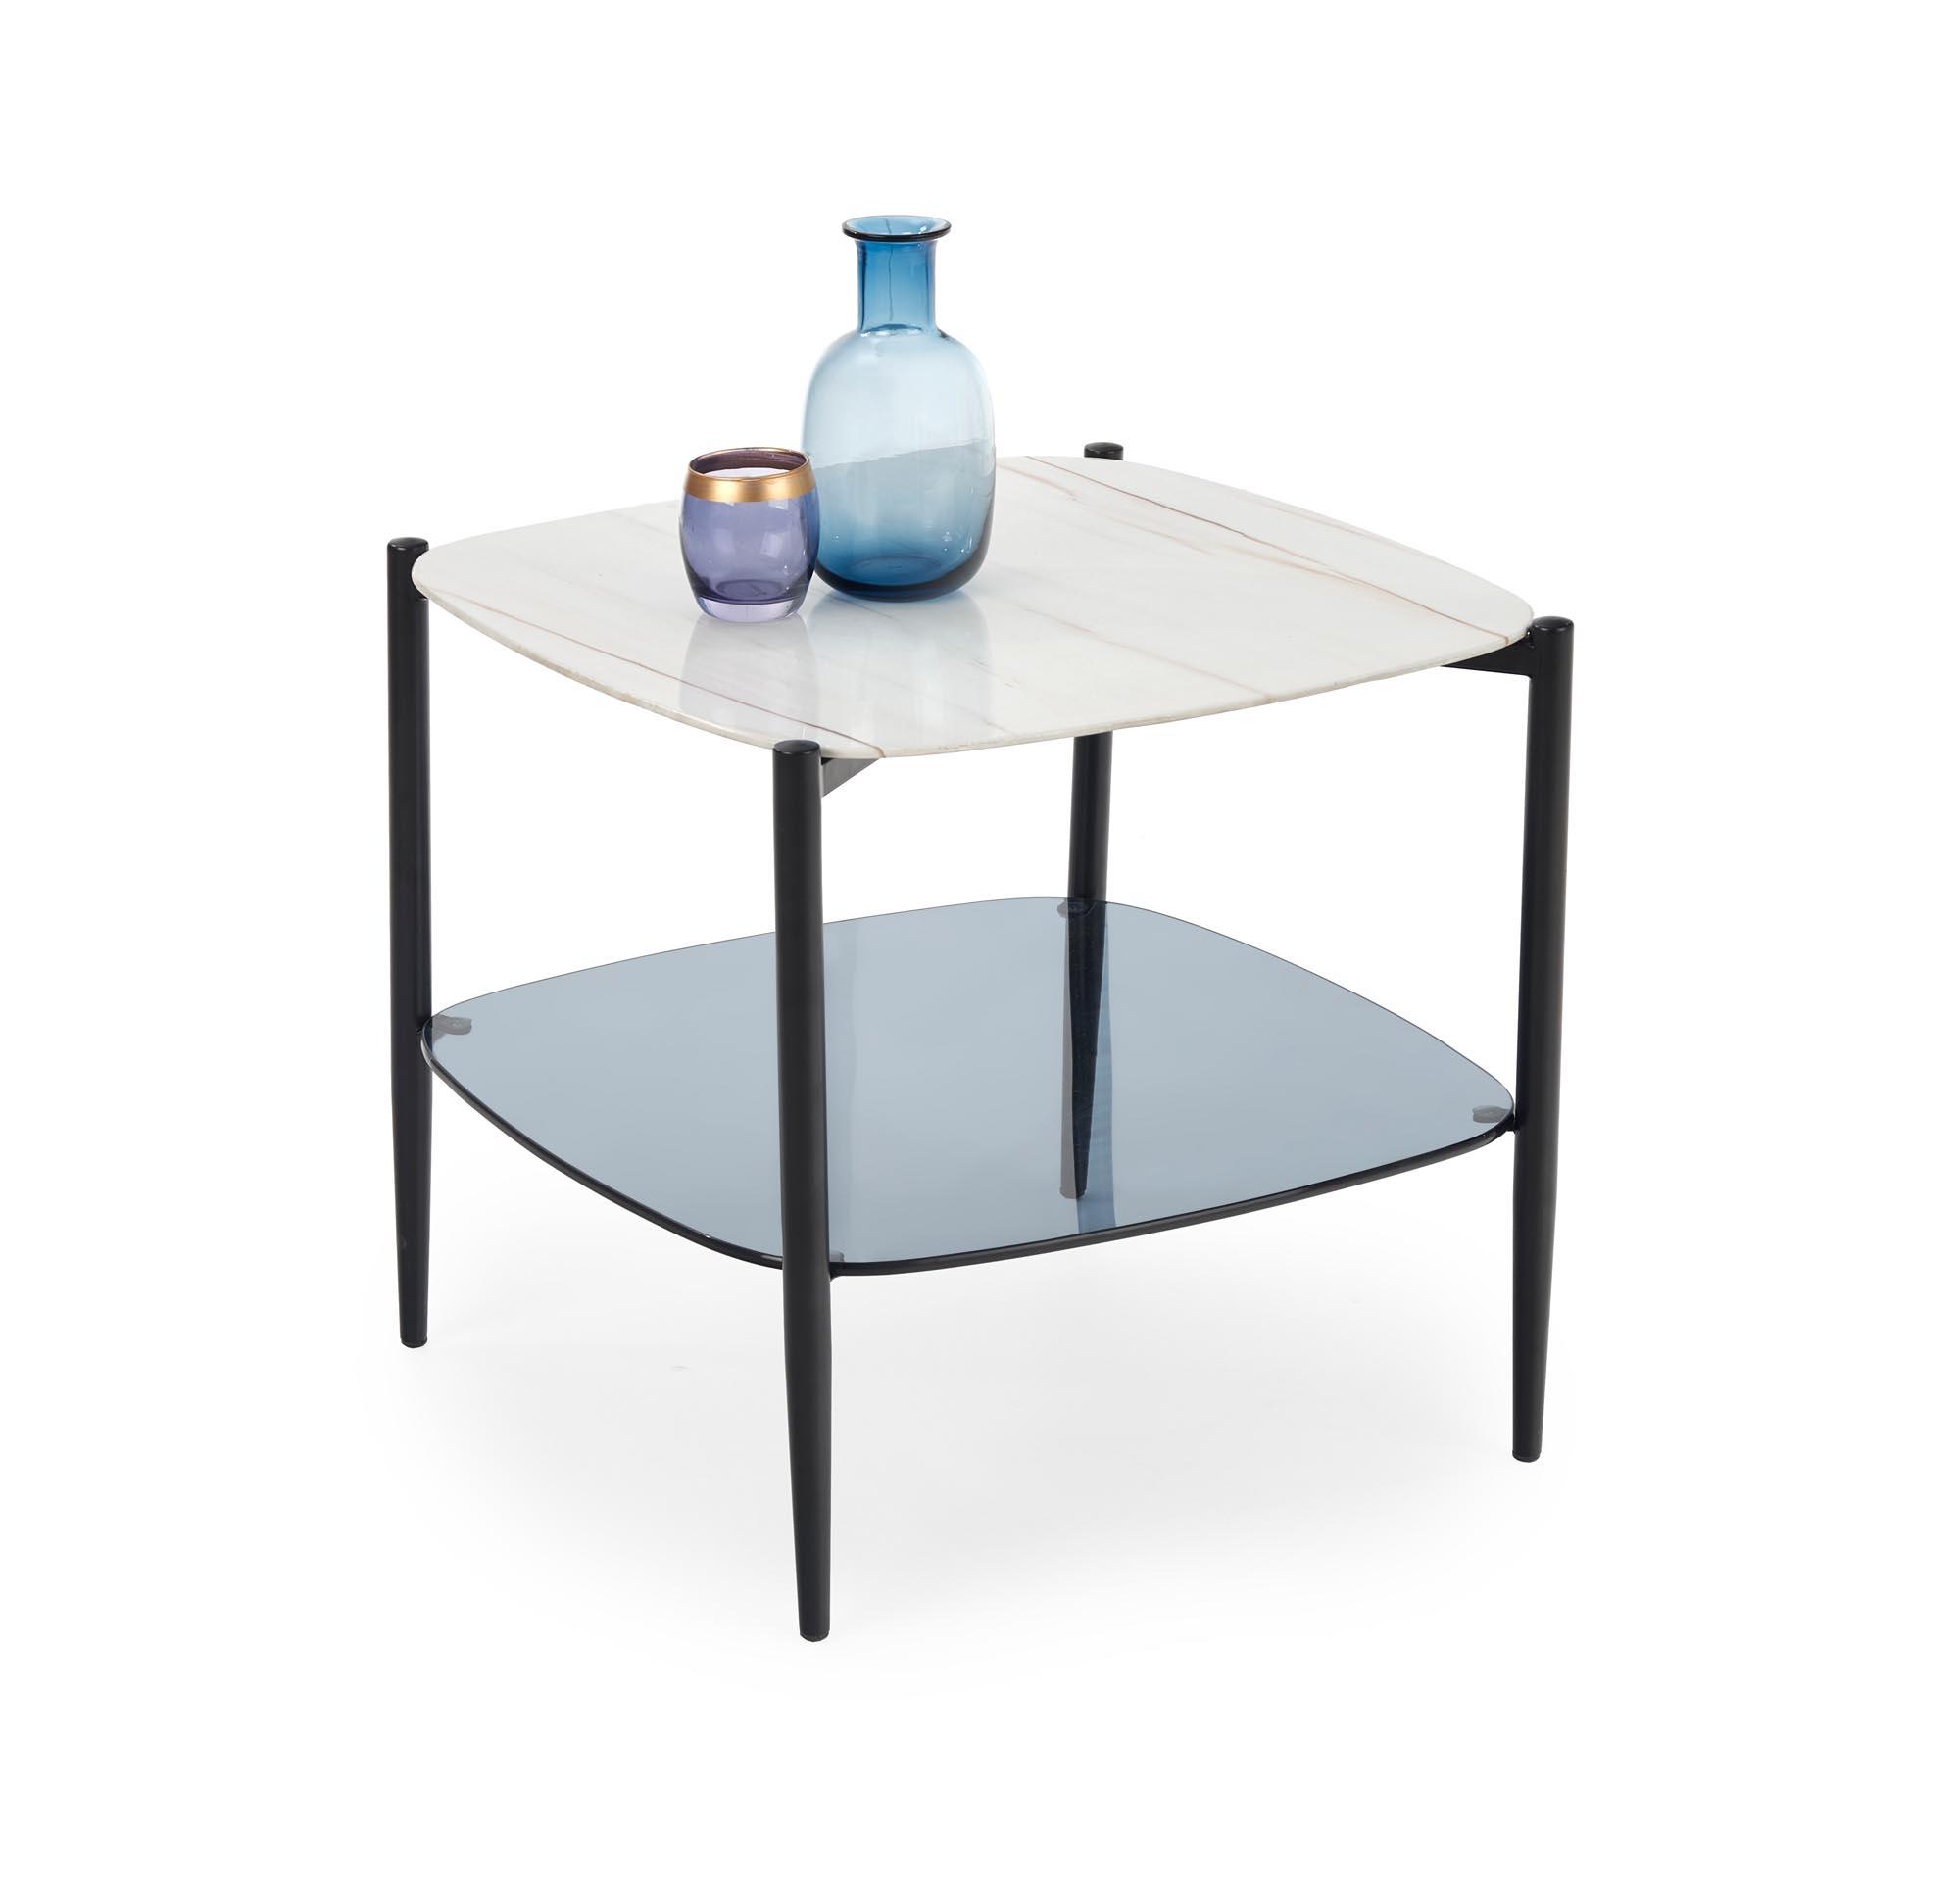 Masa de cafea din sticla si metal Gemini Alb / Negru, L55xl55xH50 cm imagine